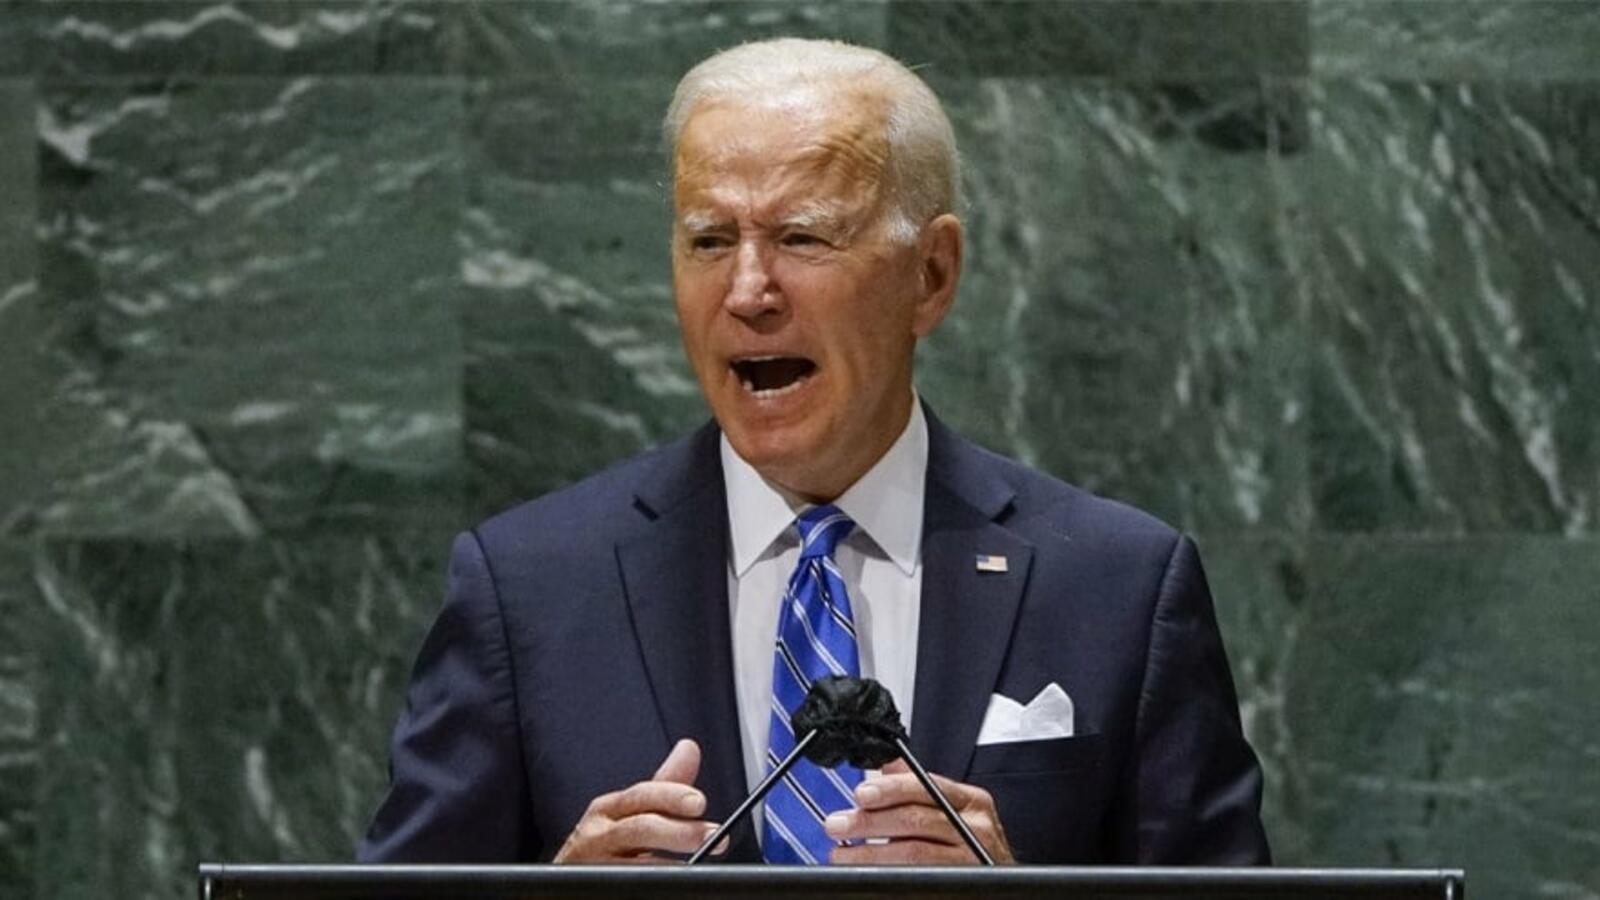 WATCH: Biden Finally Admits the Border is NOT Under Control